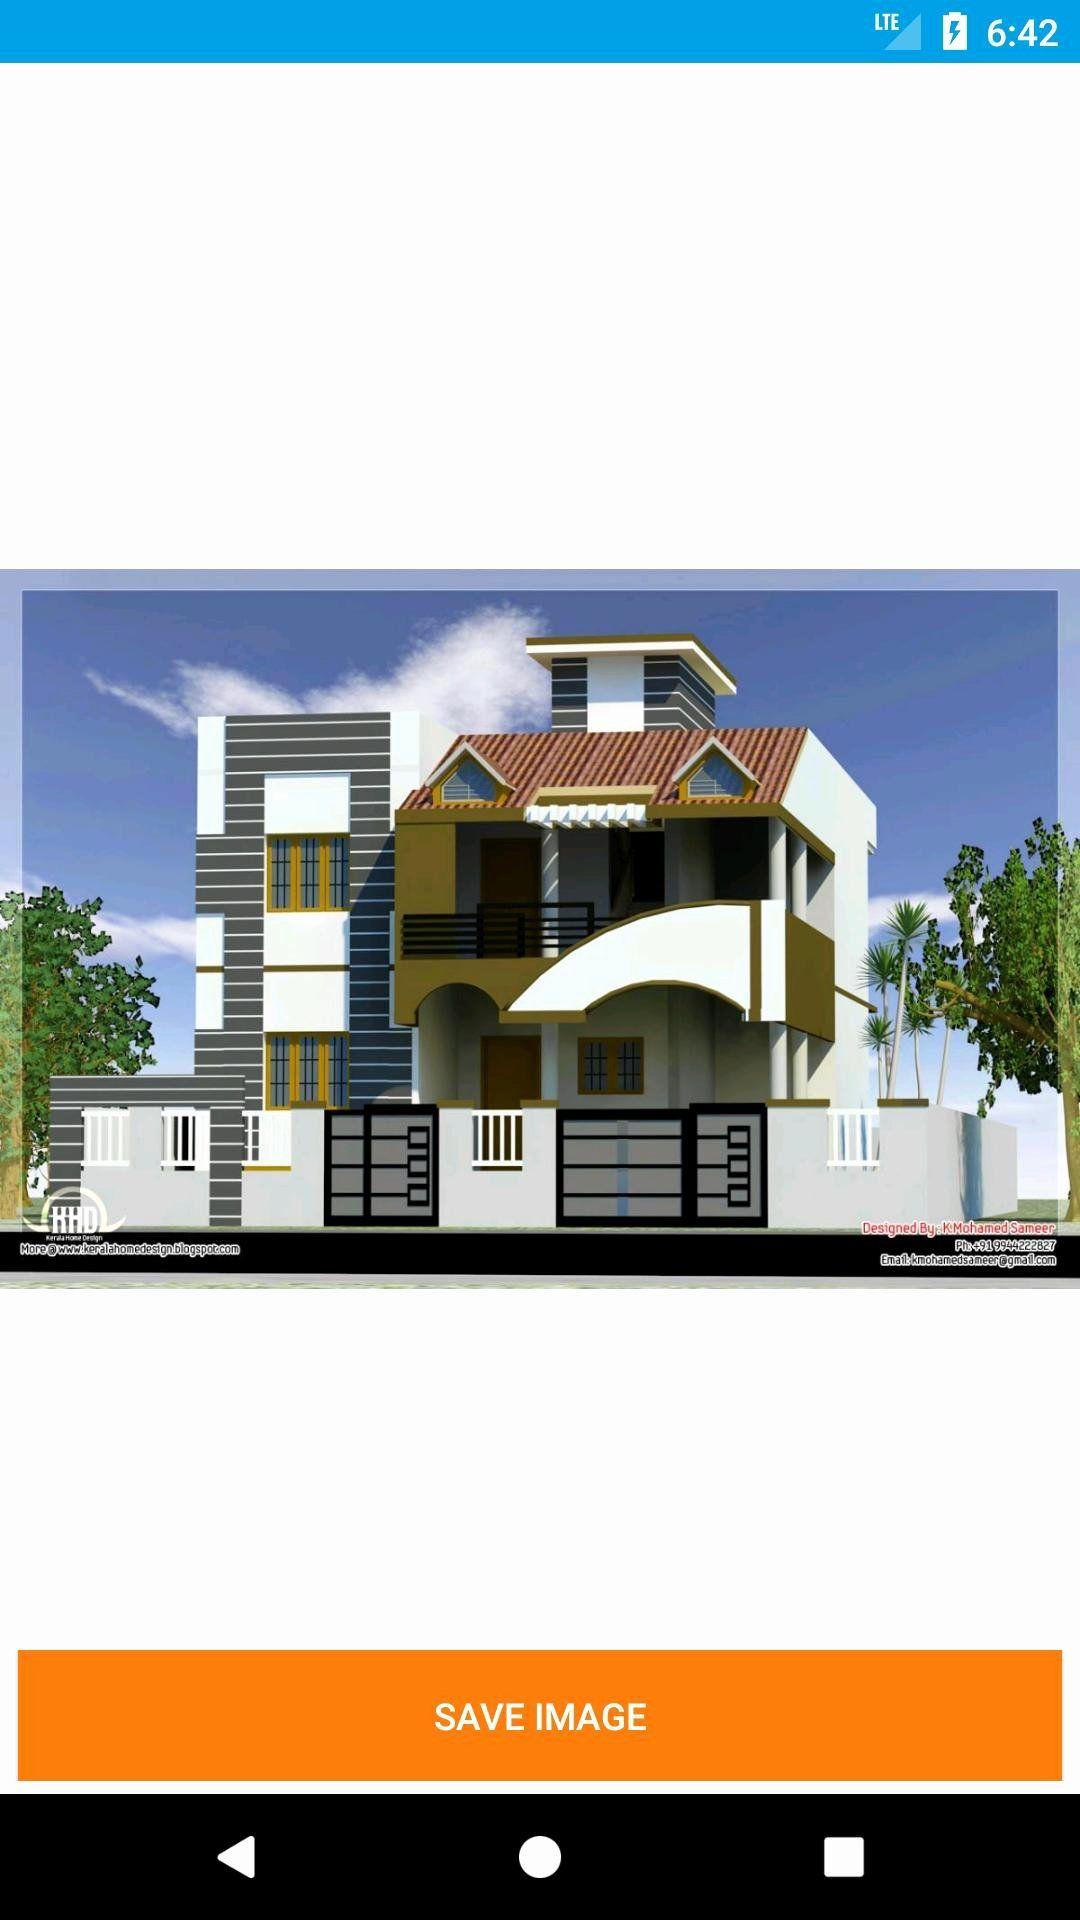 Room Planner Home Design Pro Apk Inspirational 3d Home Design Free For Android Apk Download 3d Home Design Architect House House Design